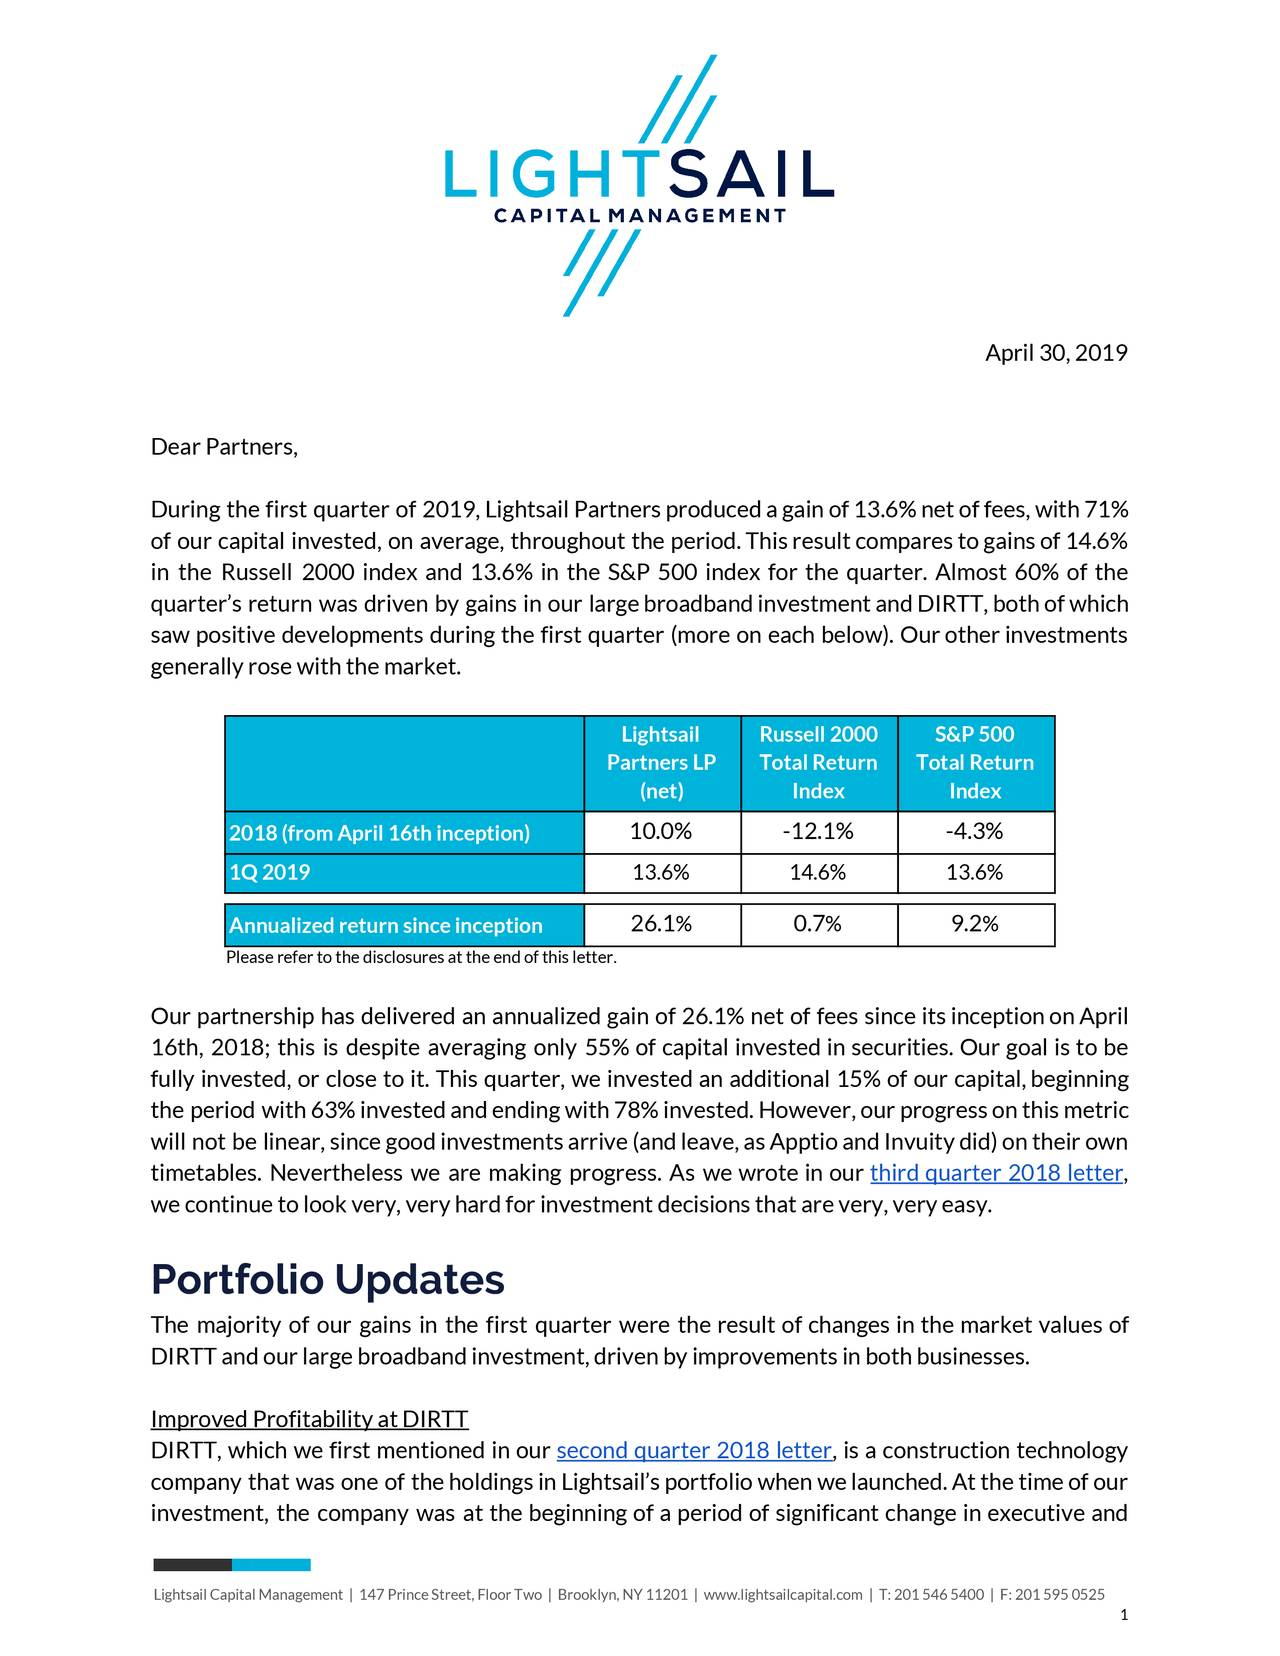 Lightsail Capital Management Q1 2019 Letter